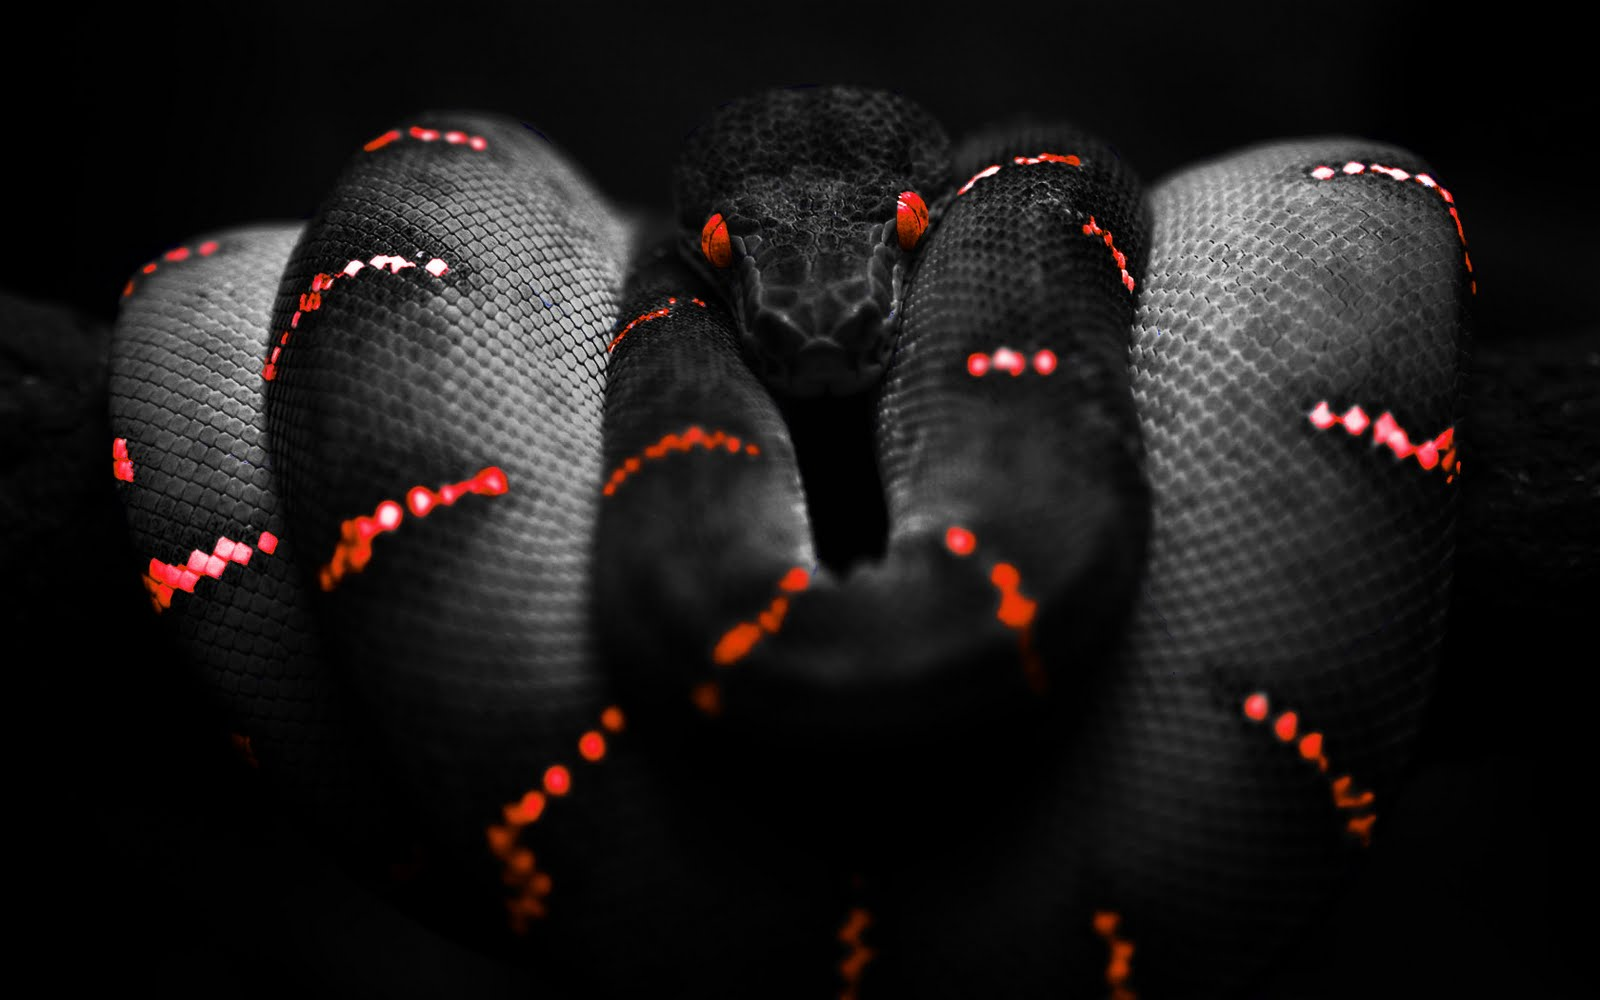 http://1.bp.blogspot.com/-pamN_2u9-XY/TaK6gsWSjTI/AAAAAAAAADI/vqhbt76ACmE/s1600/Red+black+Snake.jpg